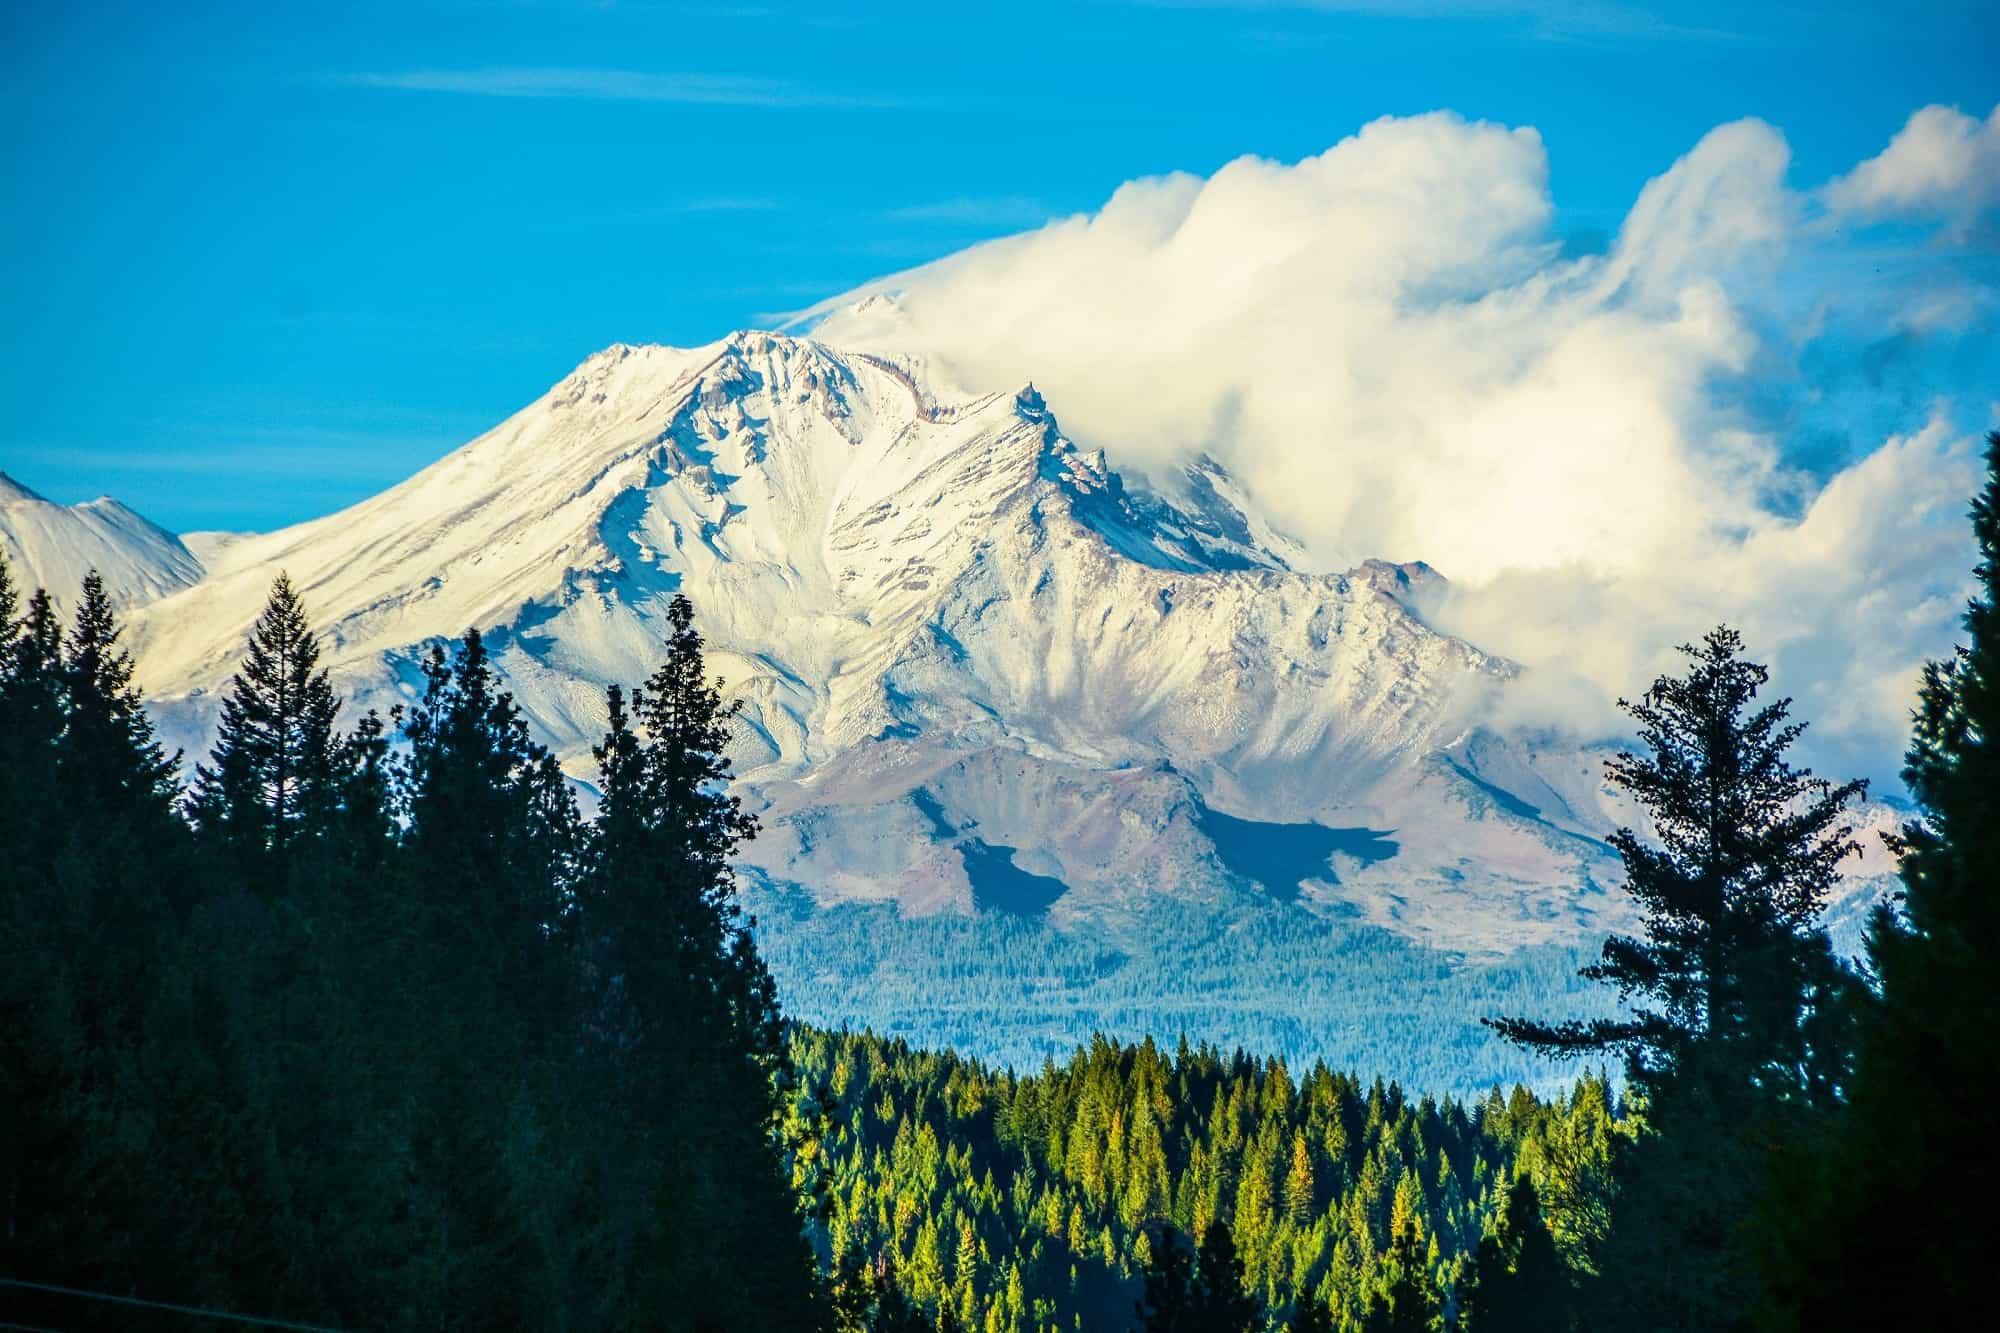 A Hidden Gem:Kid-Friendly Mount Shasta